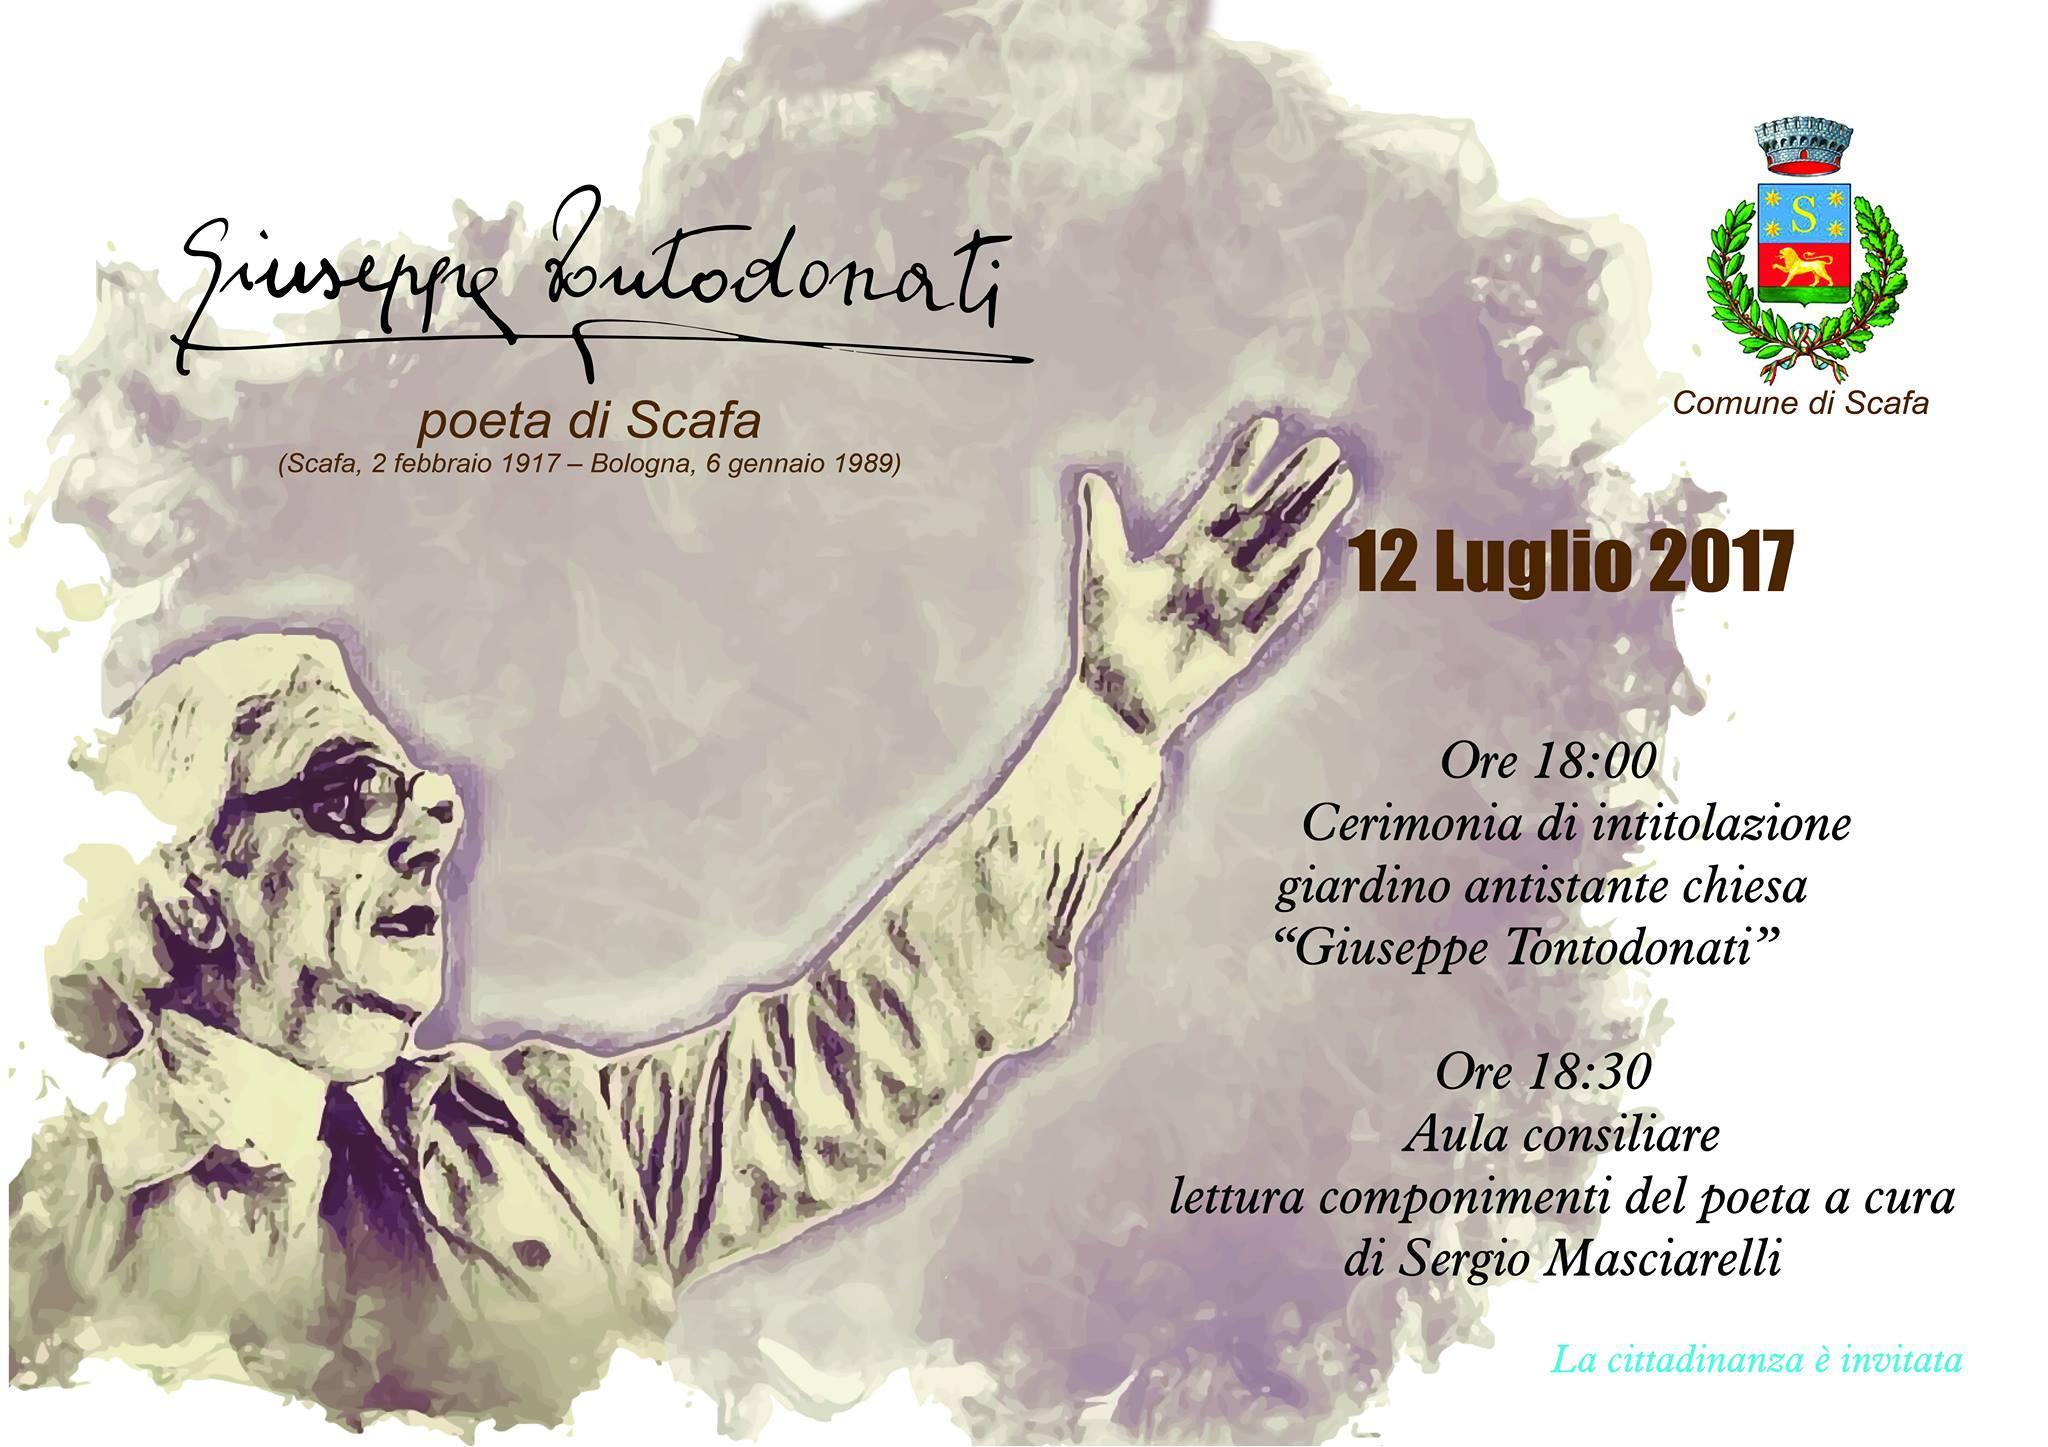 Ricorrenza del centenario della nascita del poeta Giuseppe Tontodonati